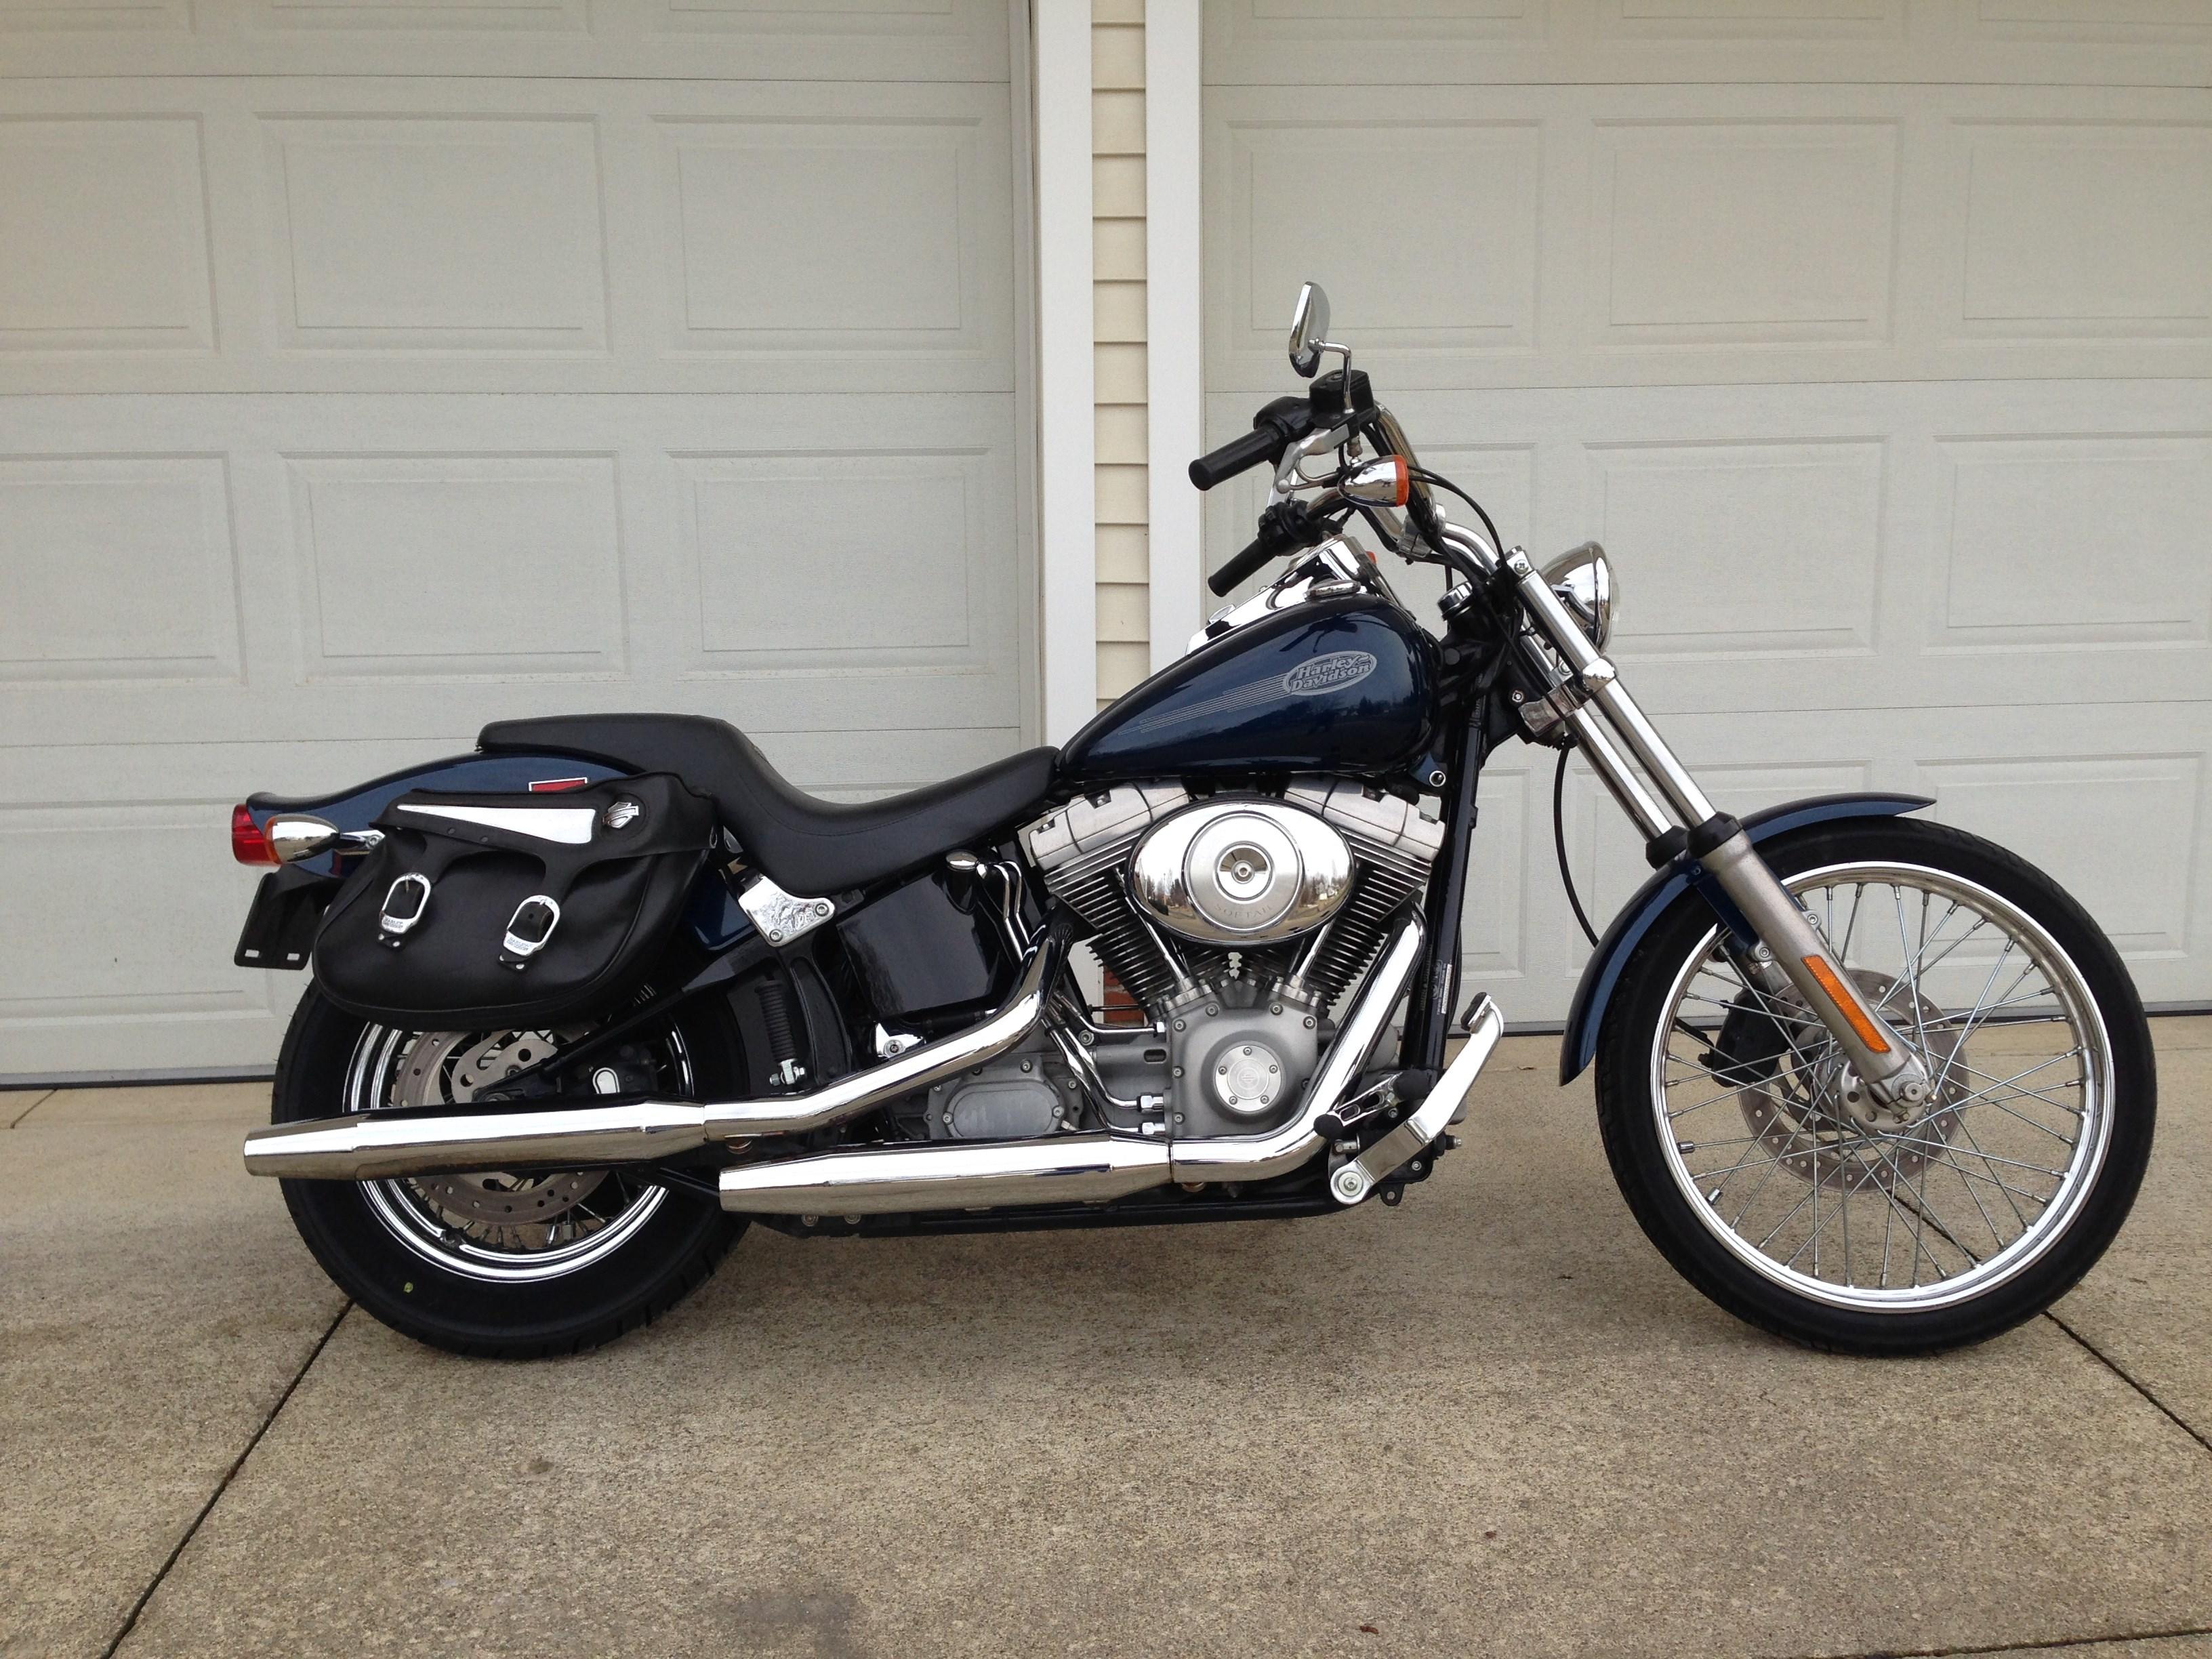 Used Motorcycles Nj >> 2002 Harley-Davidson® FXST/I Softail® Standard (Blue), Orrville, Ohio (648501) | ChopperExchange